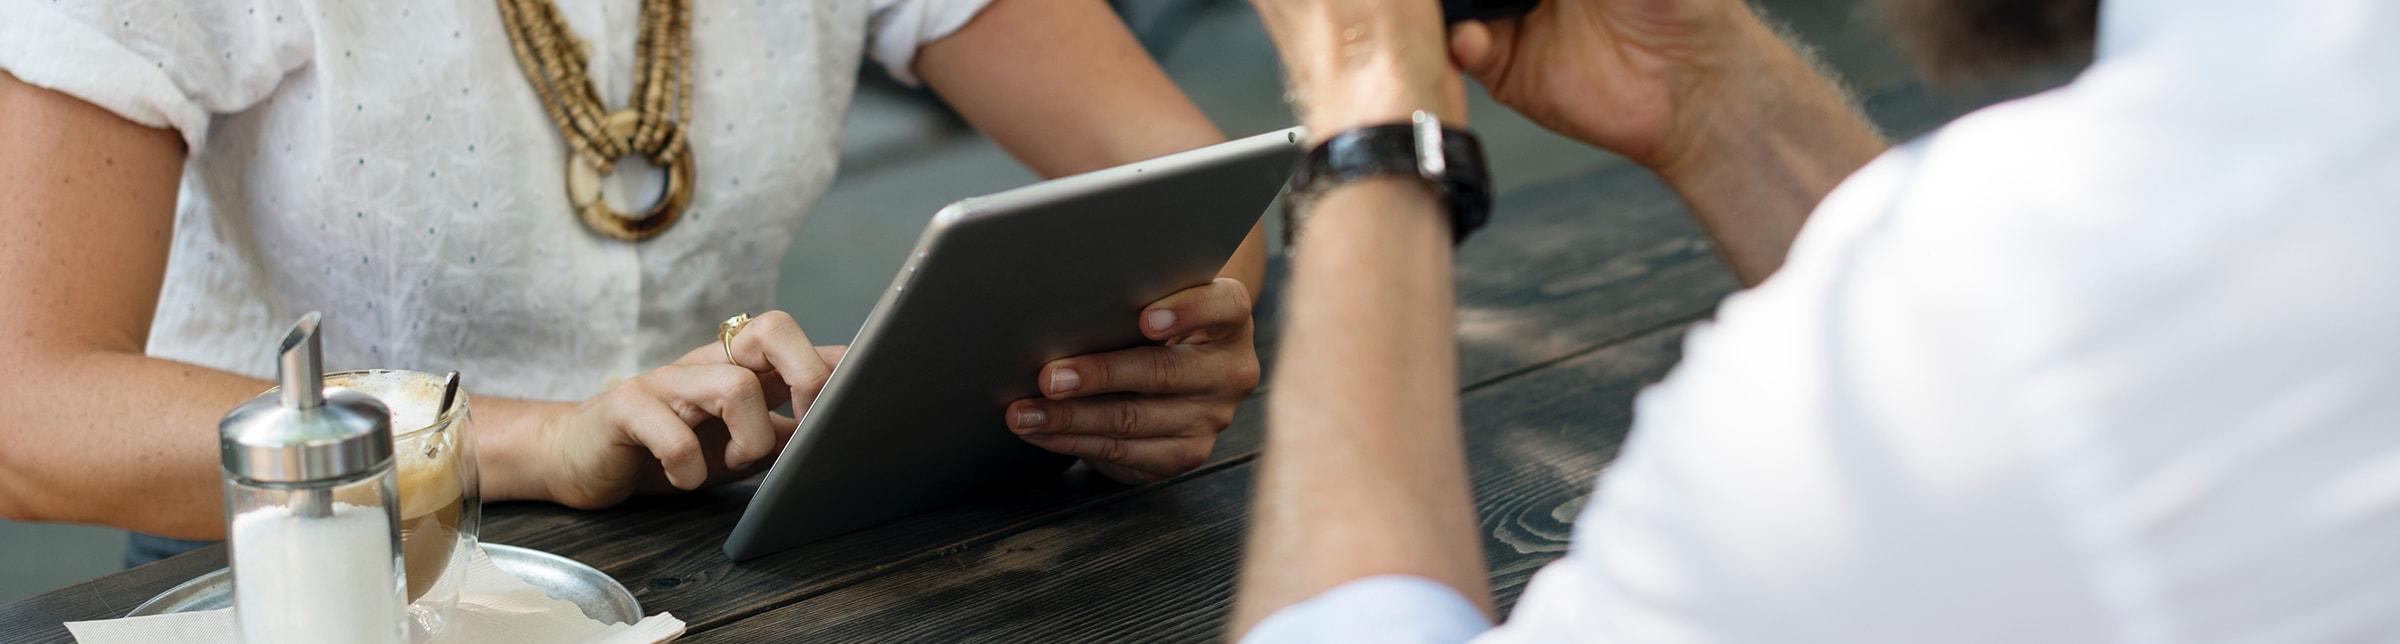 Un ragazzo seduto ad un tavolo con in mano un cellulare, di fronte una ragazza con un tablet